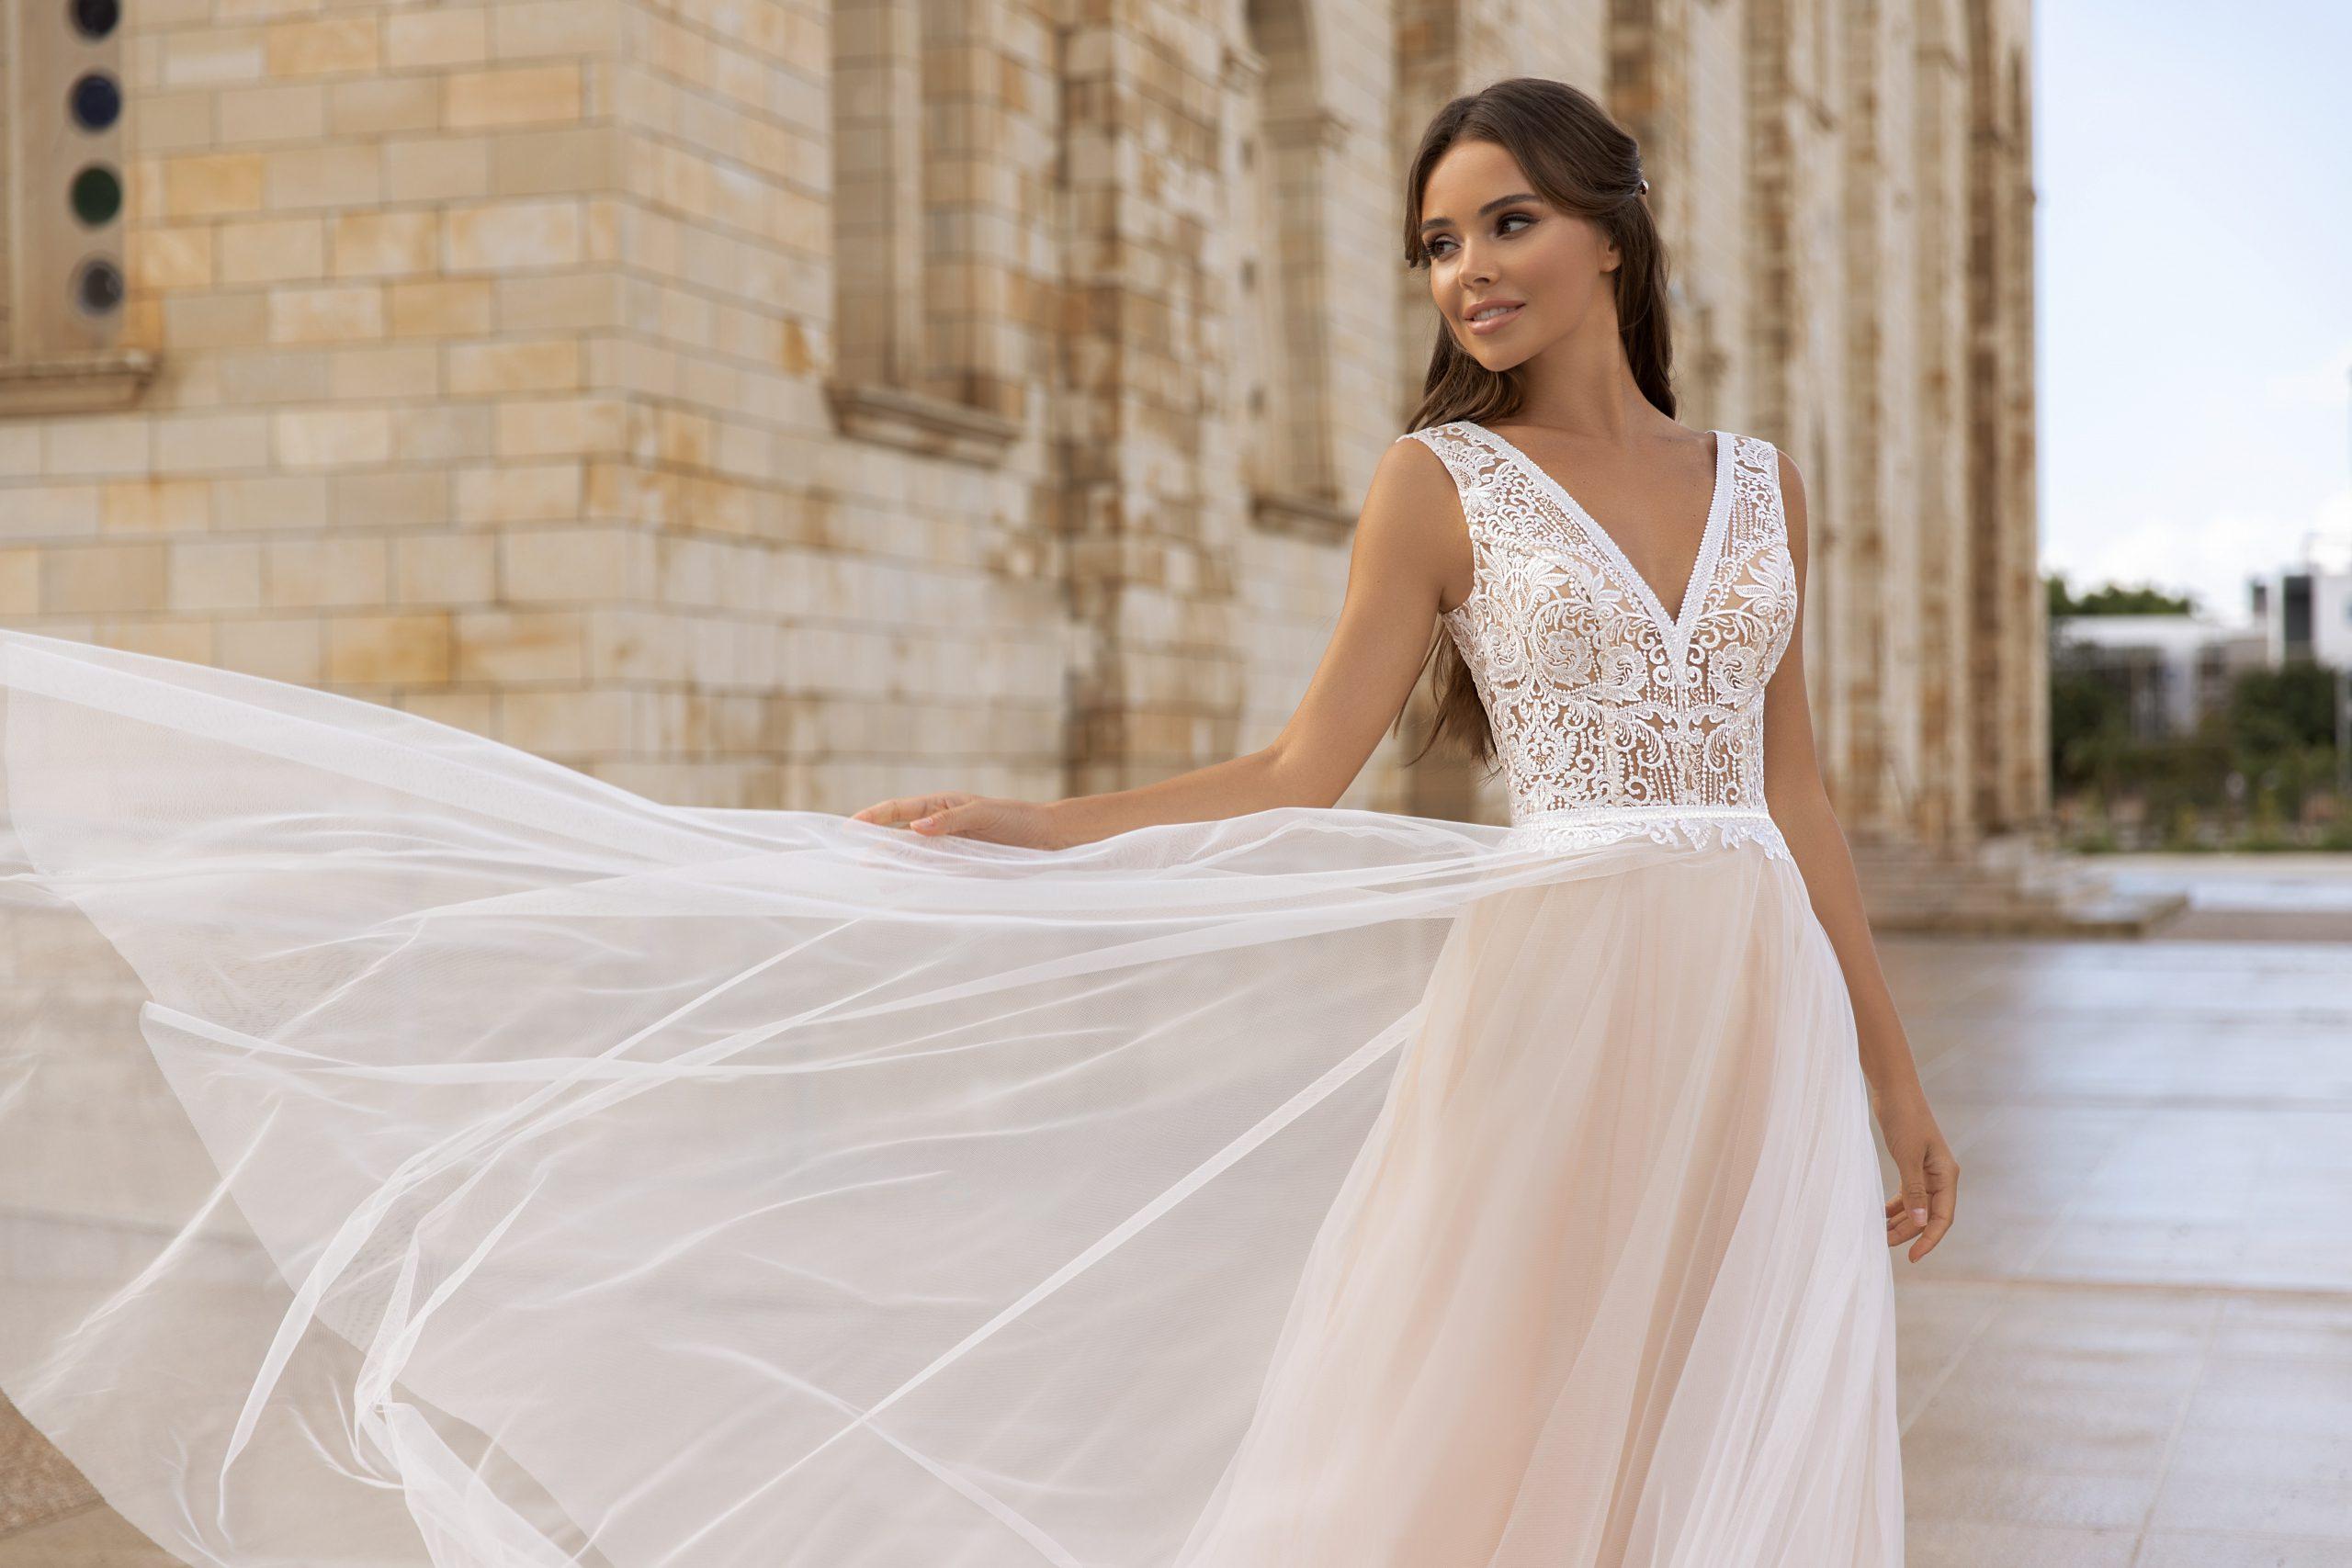 Brautkleider Vintage  Hochzeitskleider im Hippe  BoHo  Gipsy Look